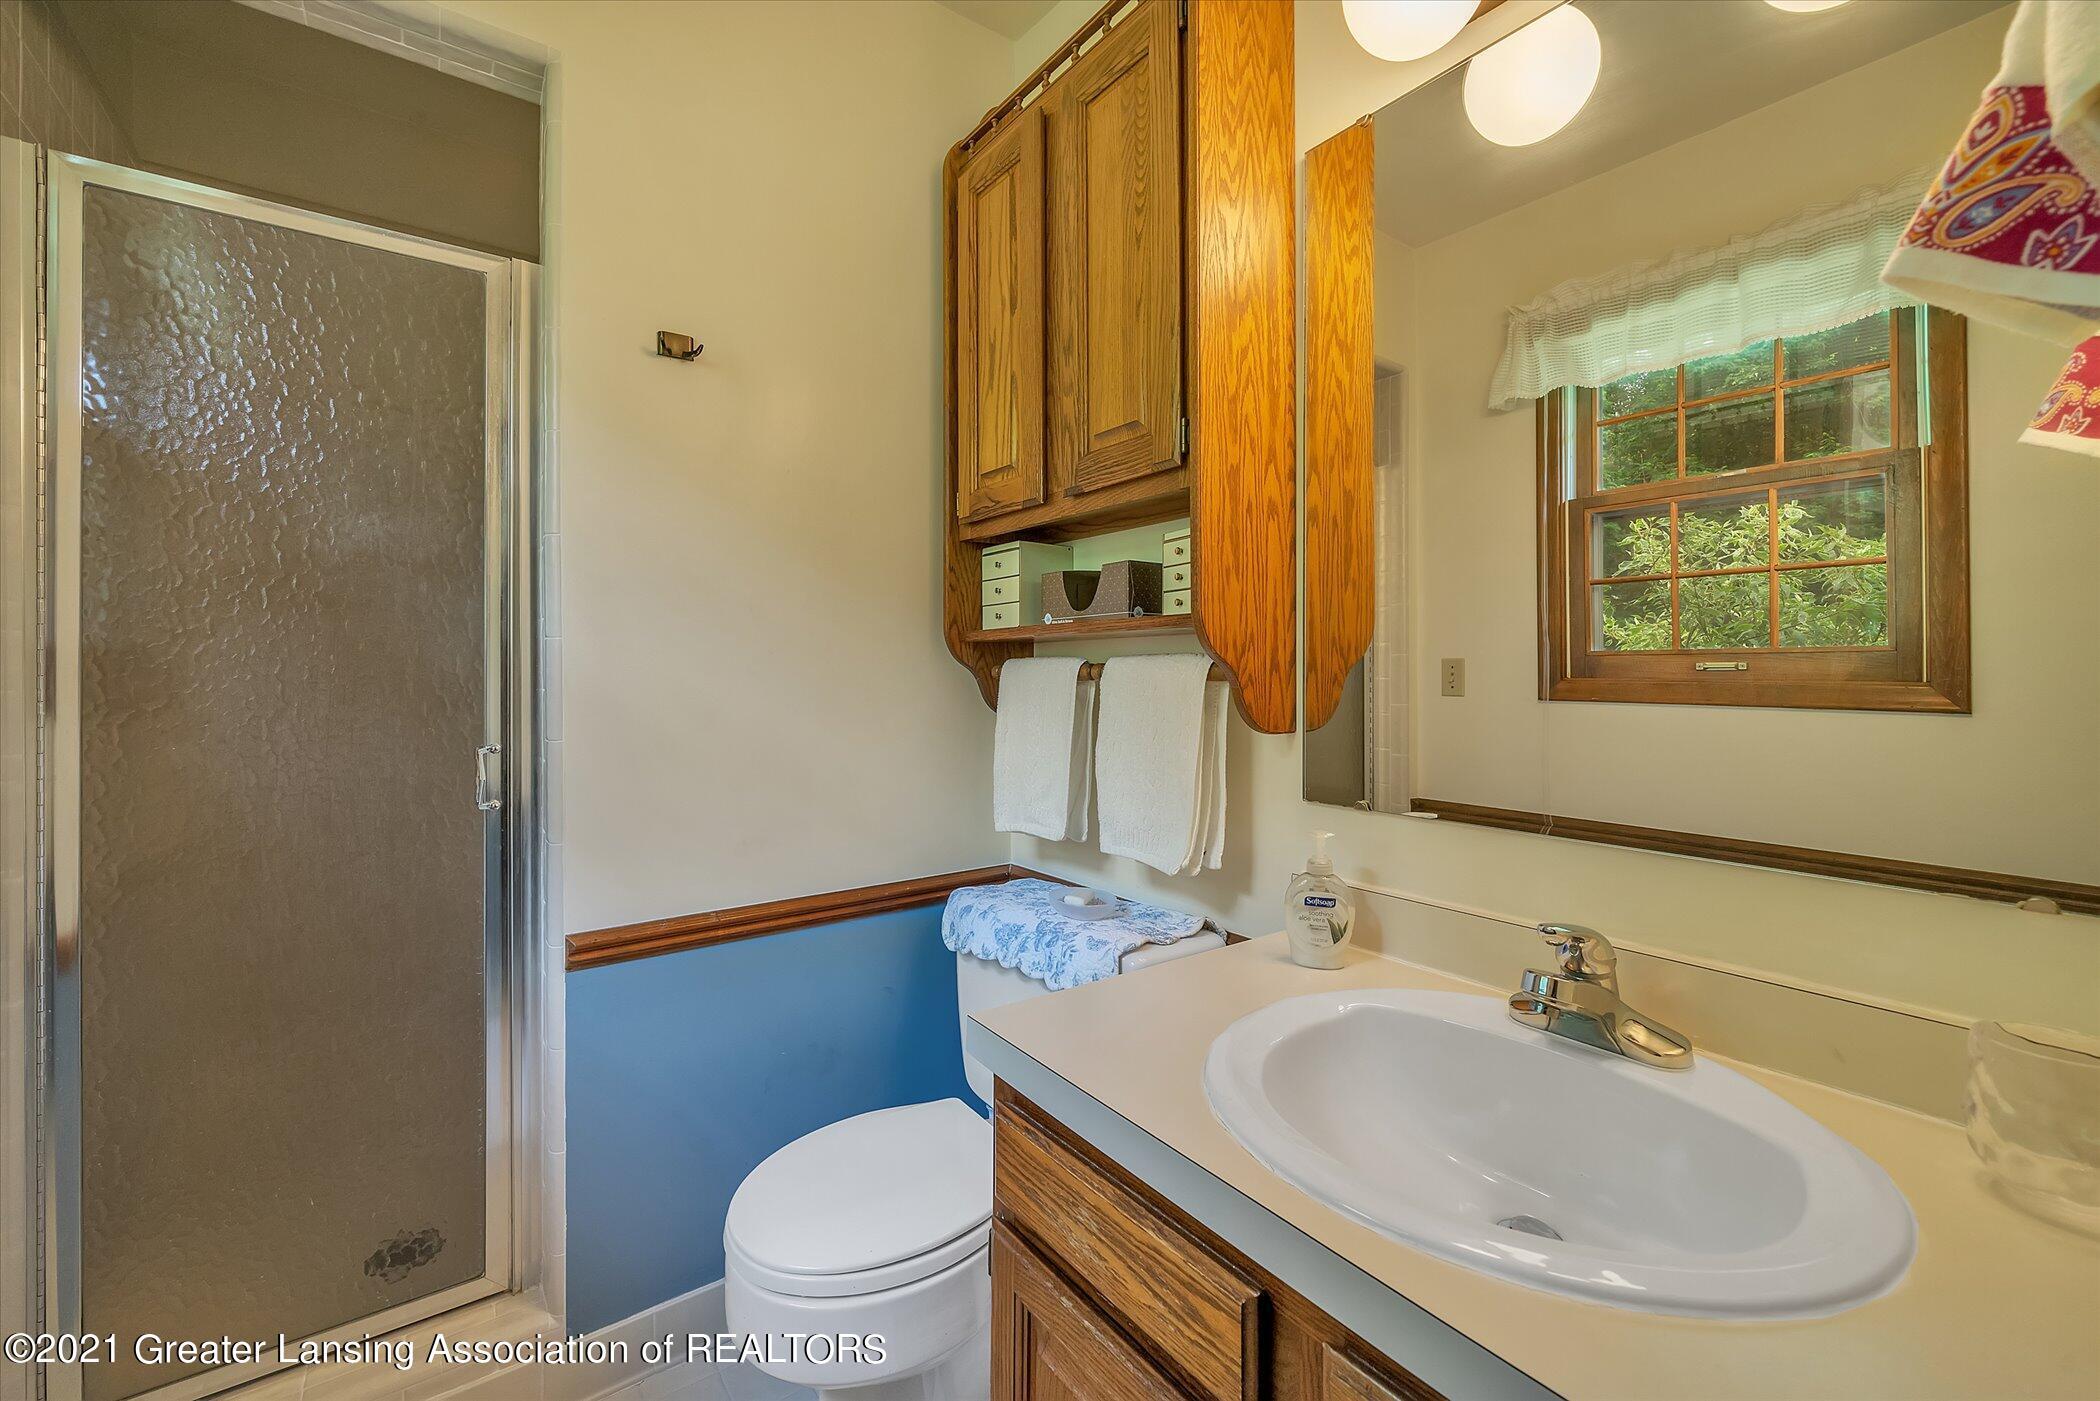 5556 Wood Valley Dr - (14) MAIN FLOOR Primary Bathroom - 14